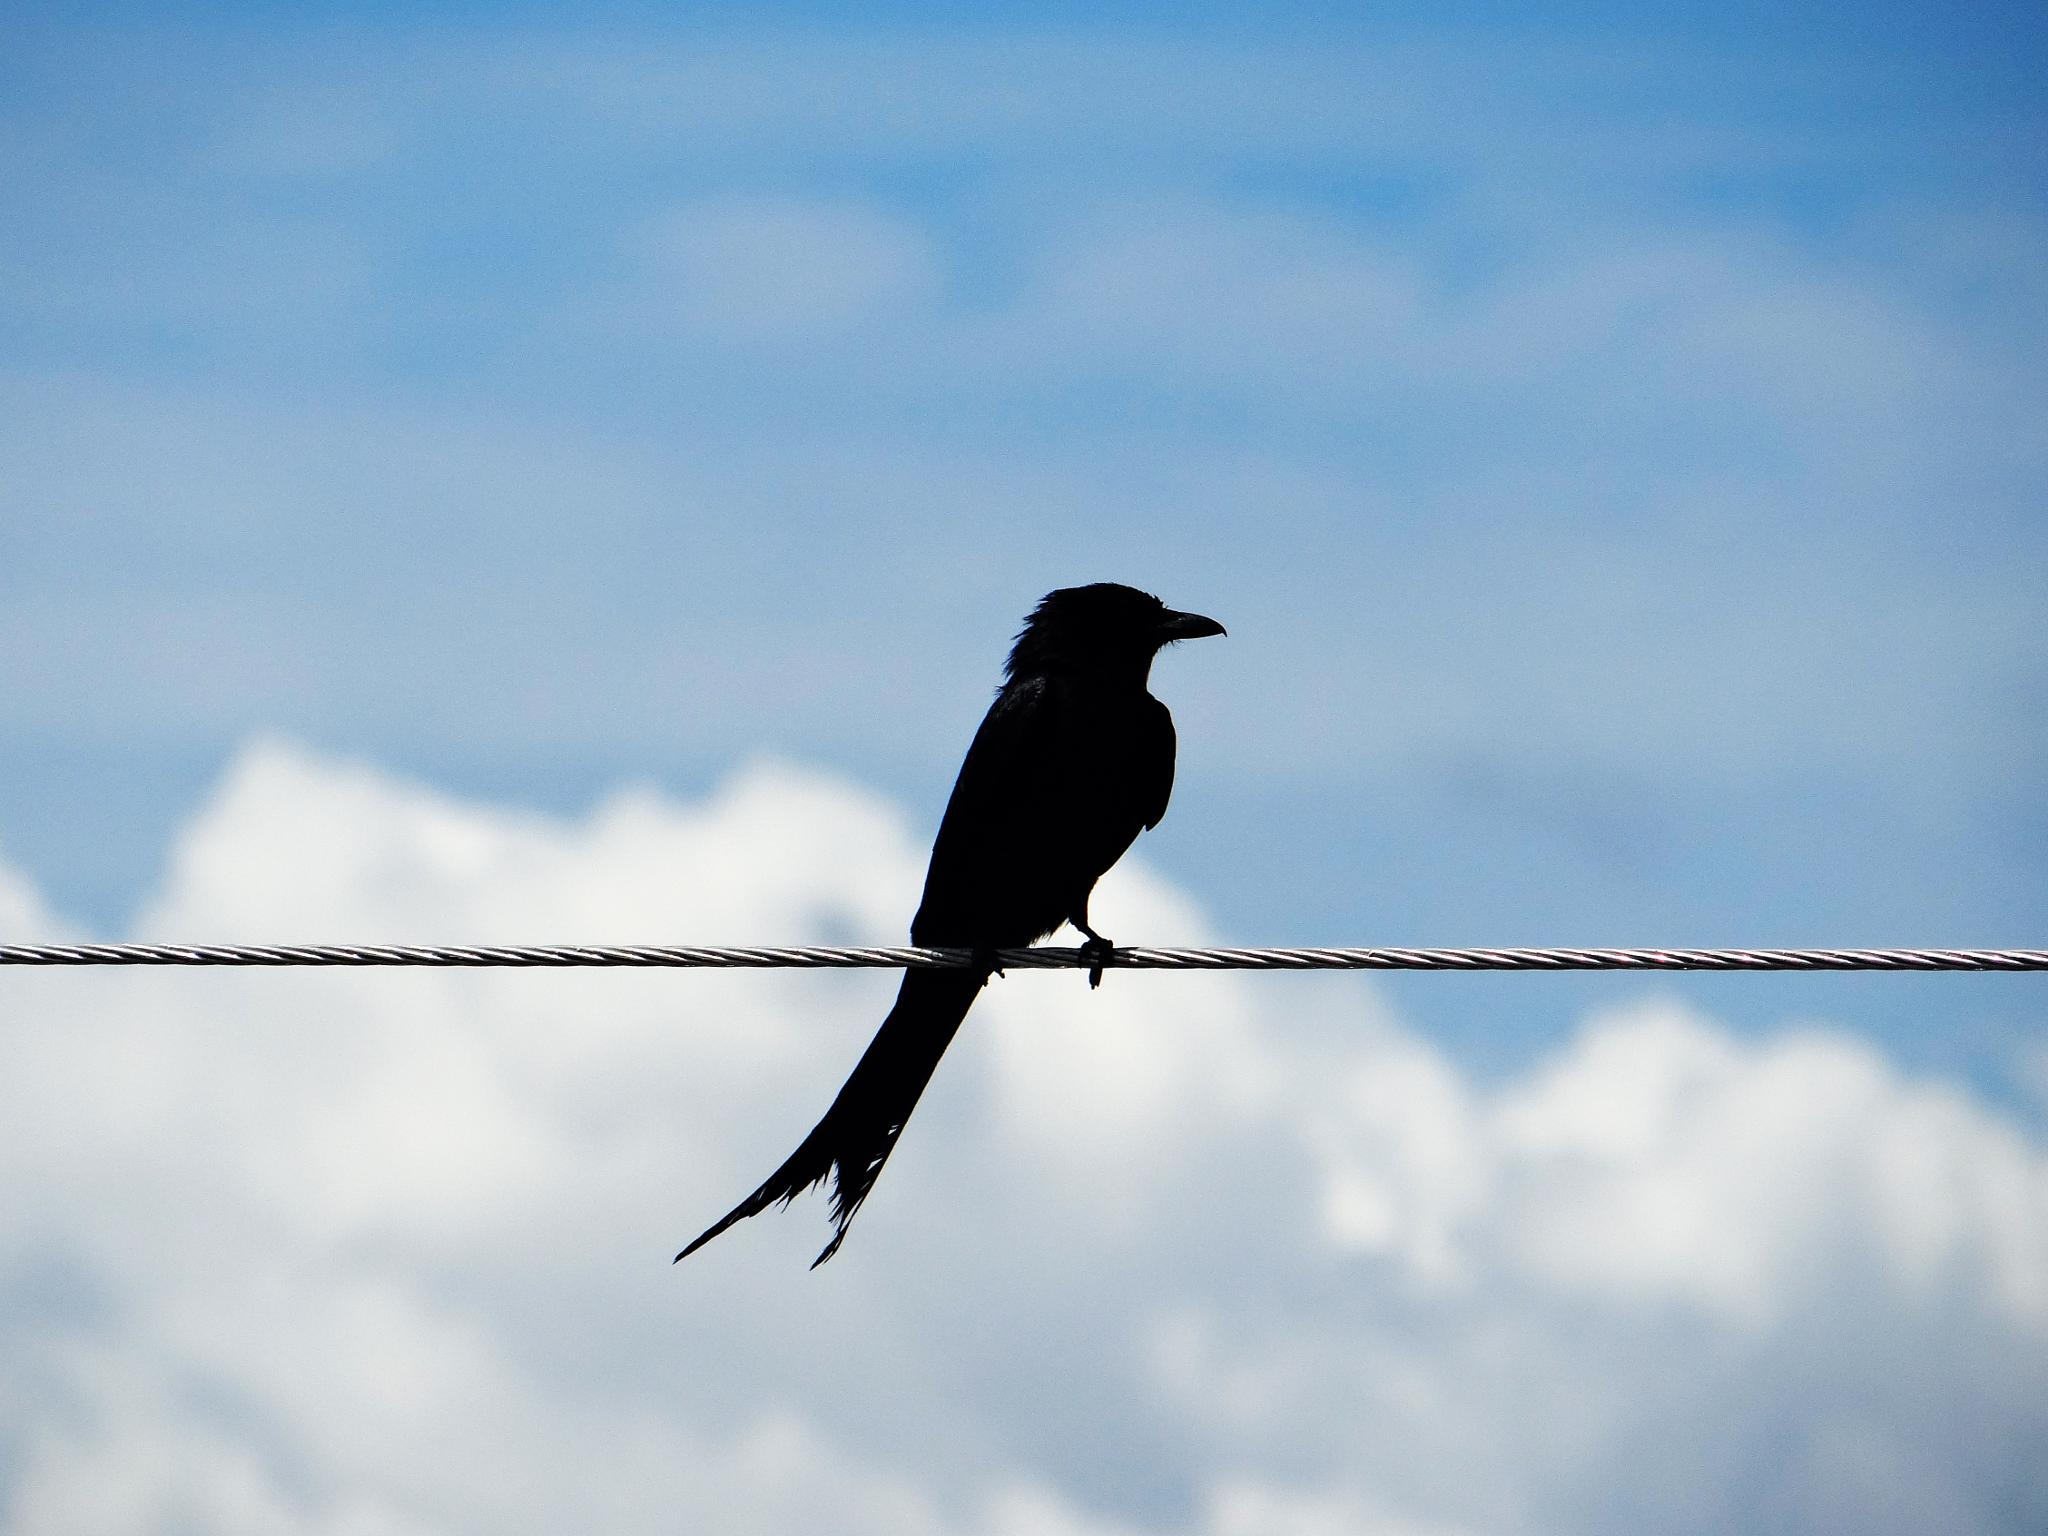 BlackBird by Asaduzzaman